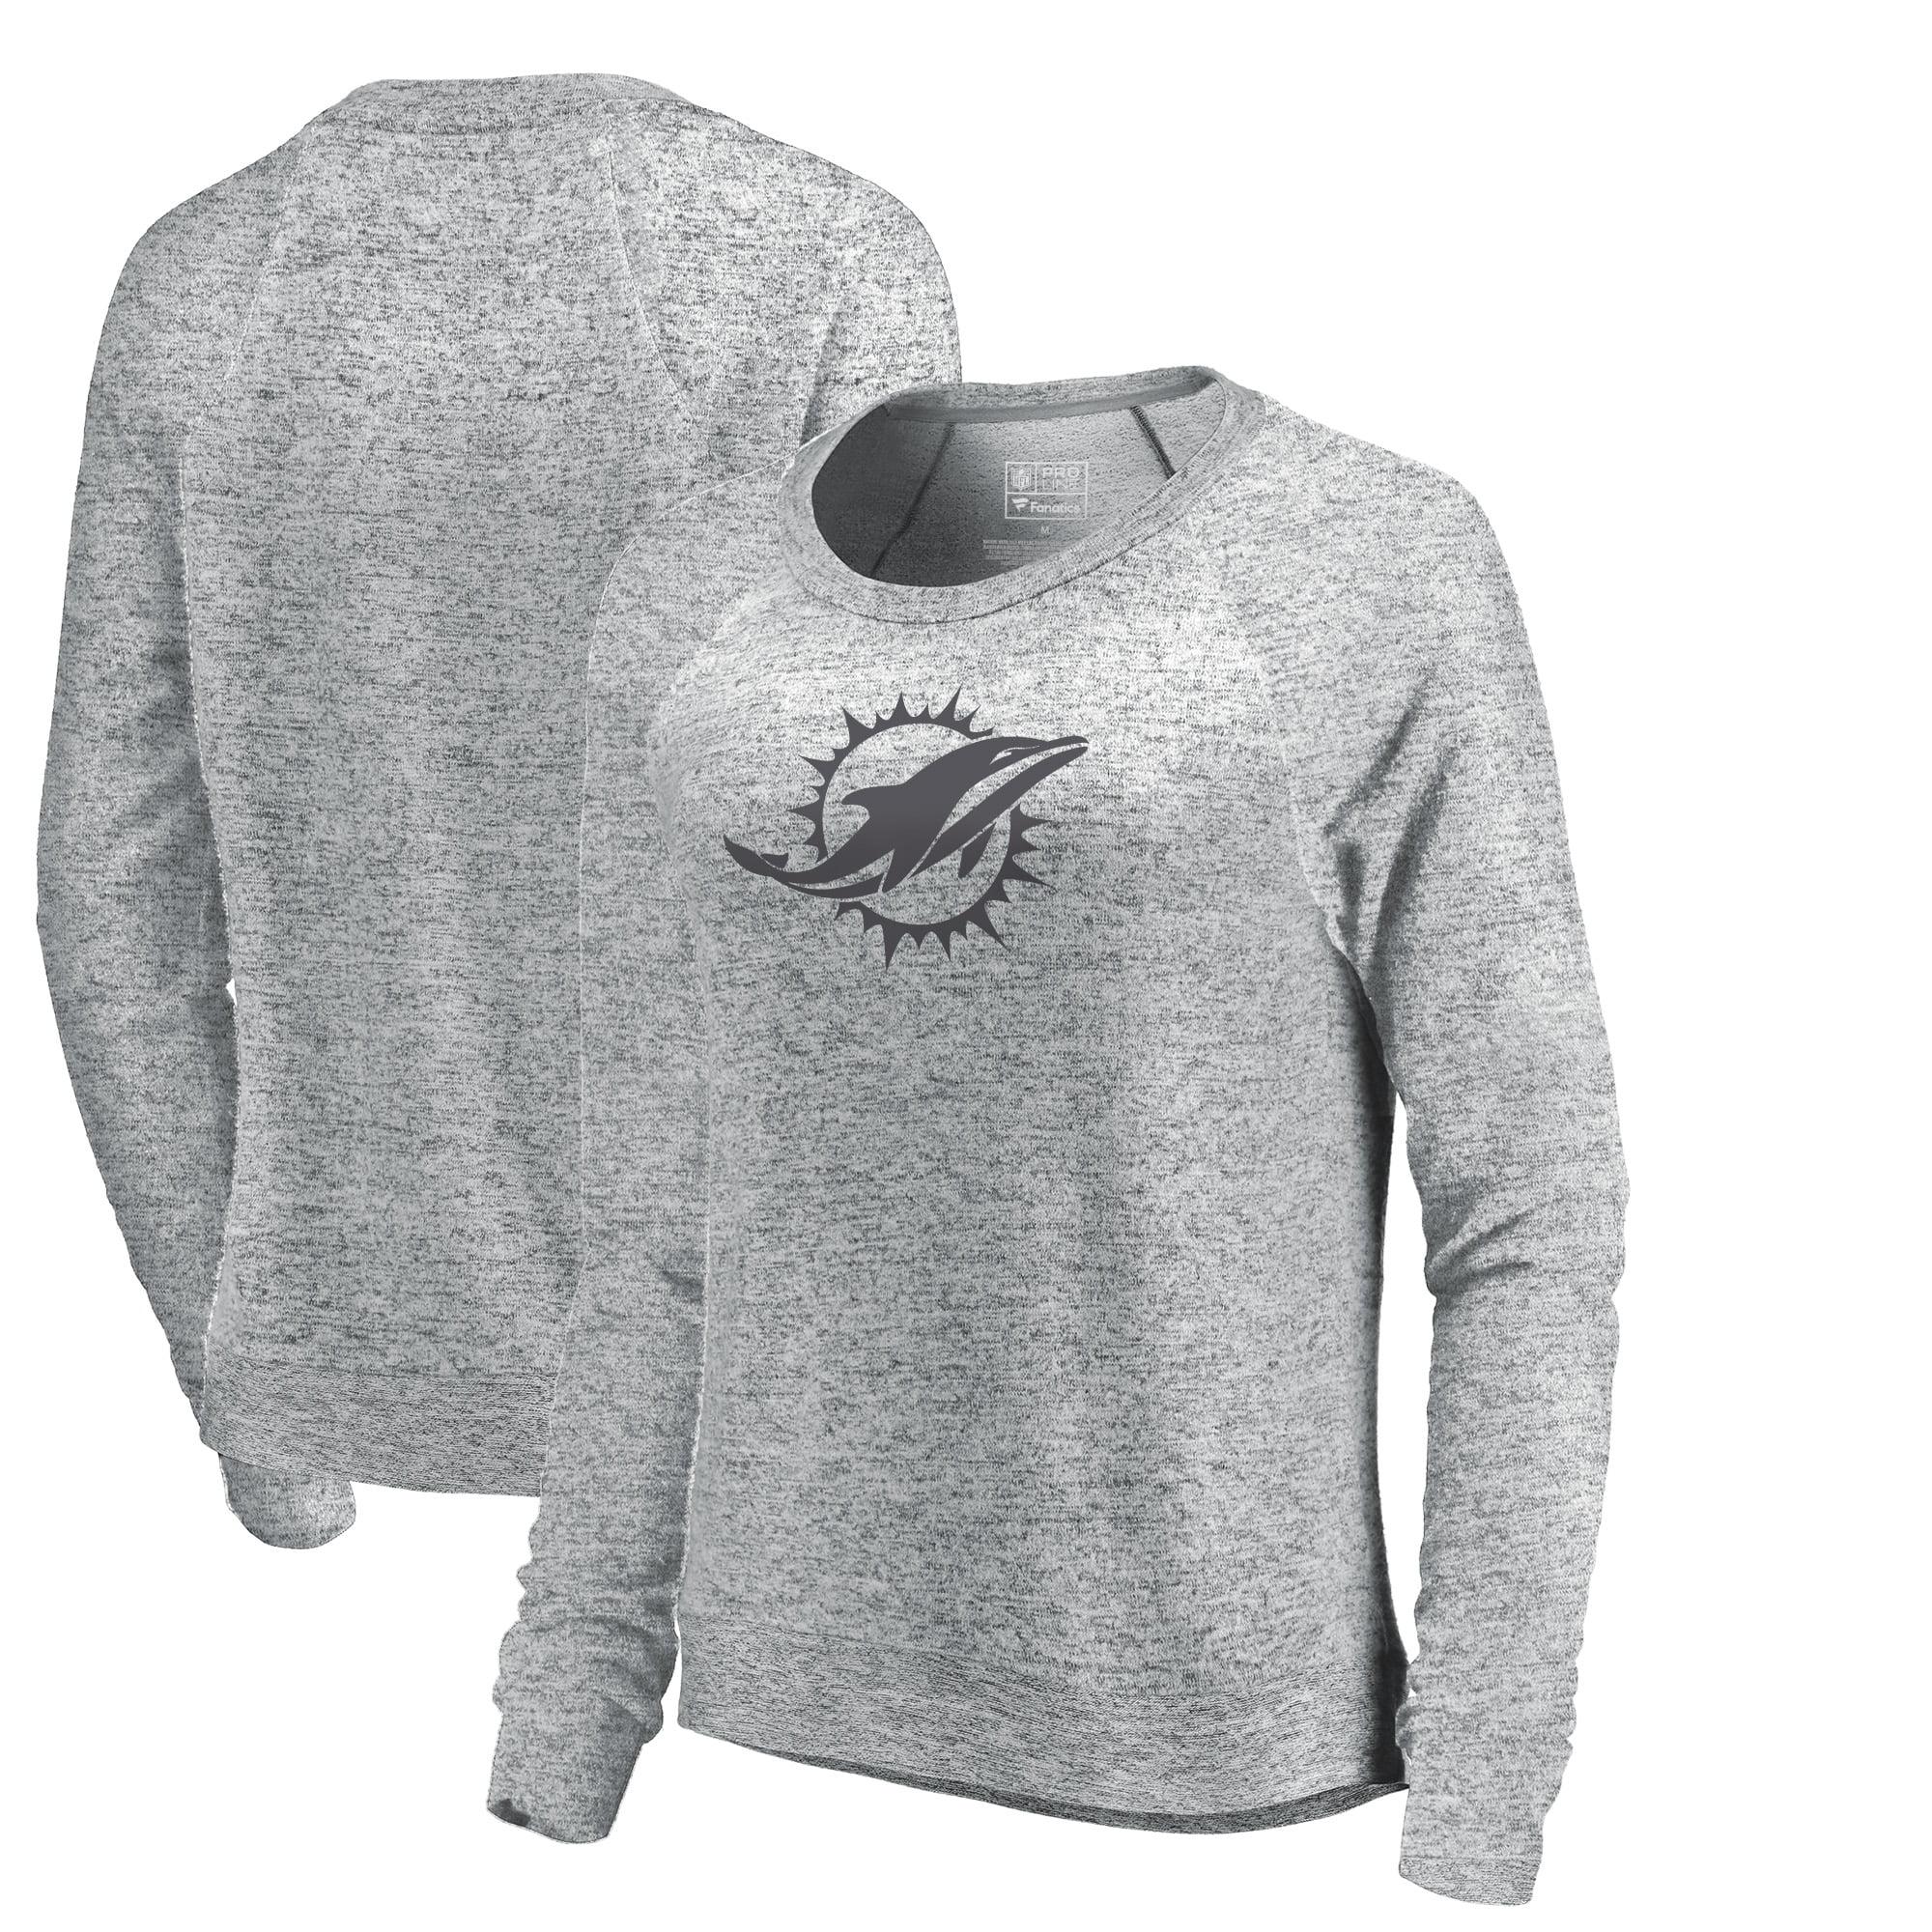 Miami Dolphins NFL Pro Line by Fanatics Branded Women's Cozy Collection Plush Crew Sweatshirt - Ash